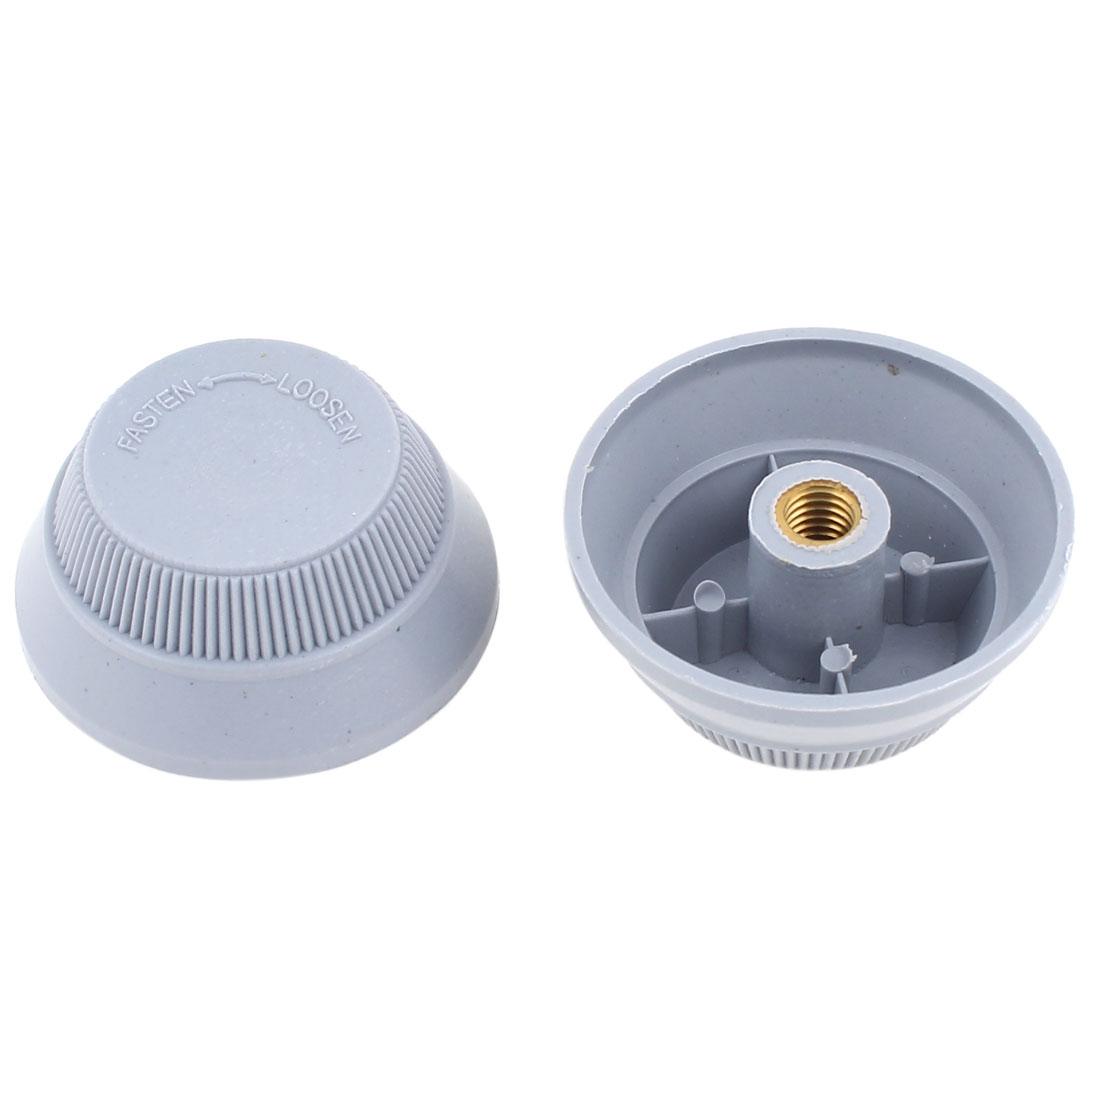 2Pcs Female Type 51mm Dia Gray Plastic Electric Fan Lock Nut